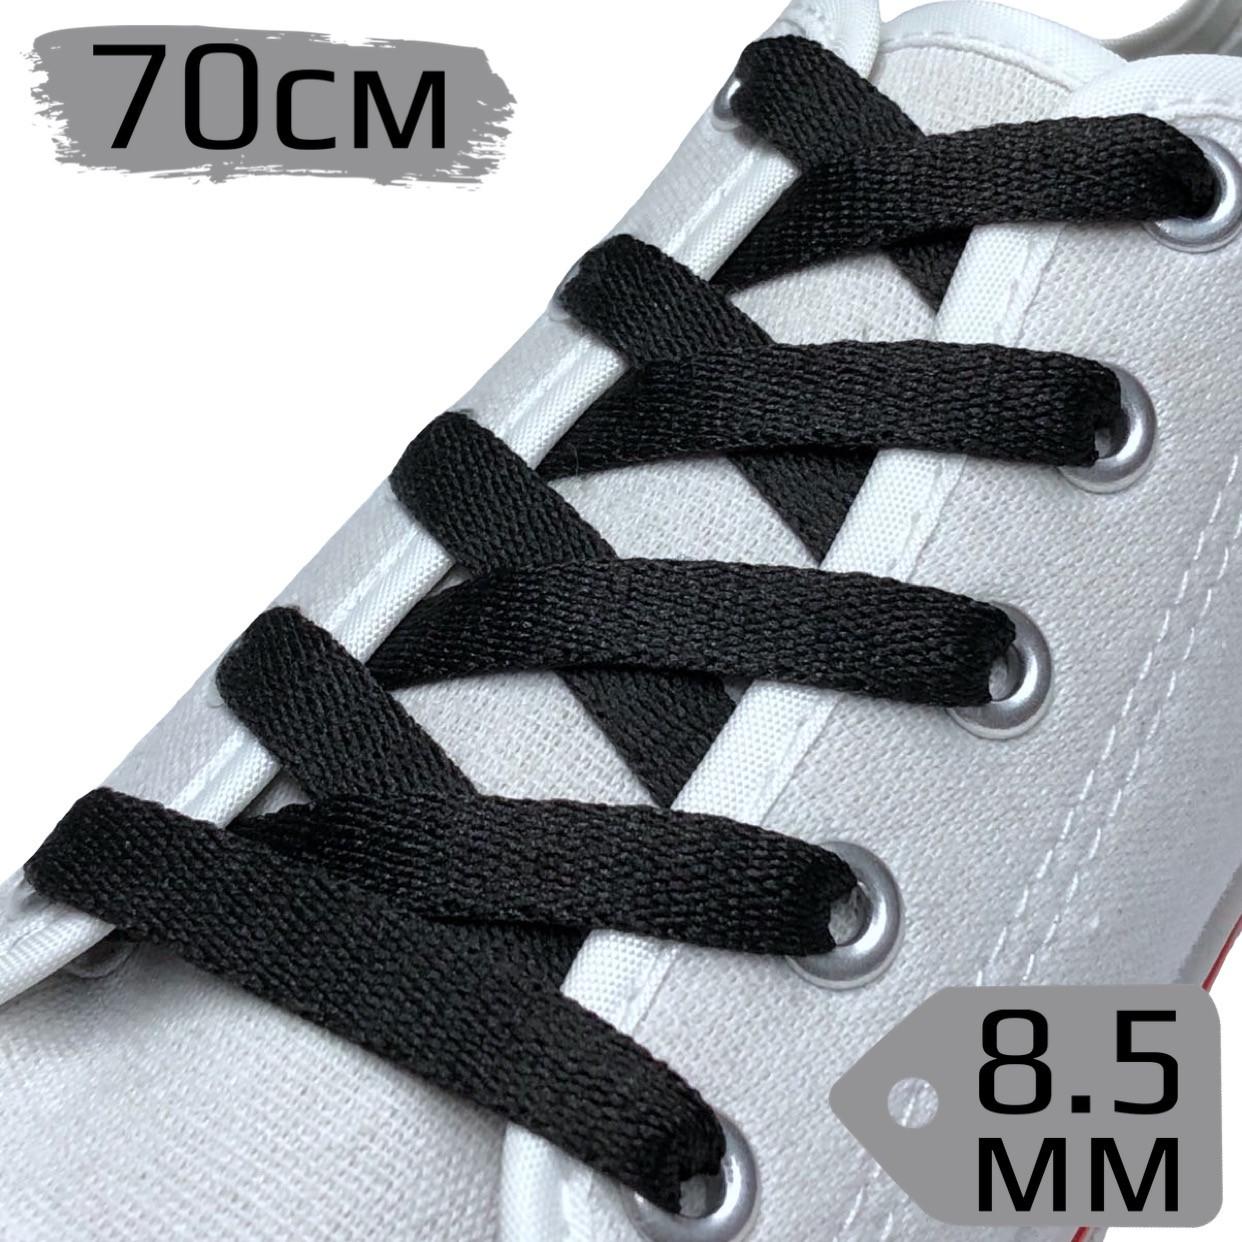 Шнурки для обуви ПЛОСКИЙ, чёрный, ширина 8.5мм